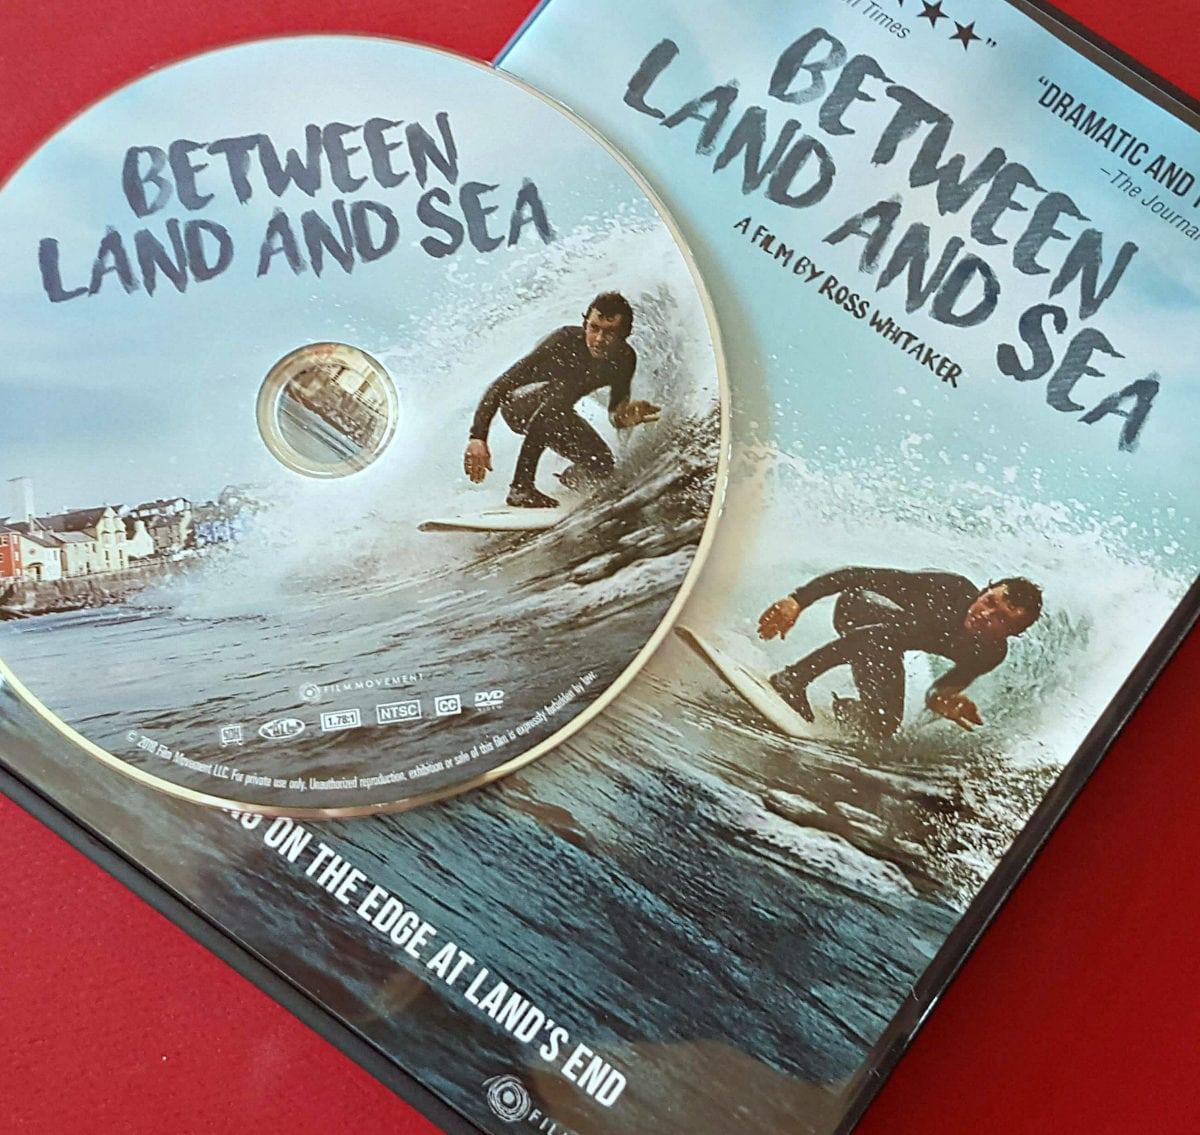 between land and sea irish surfing movie